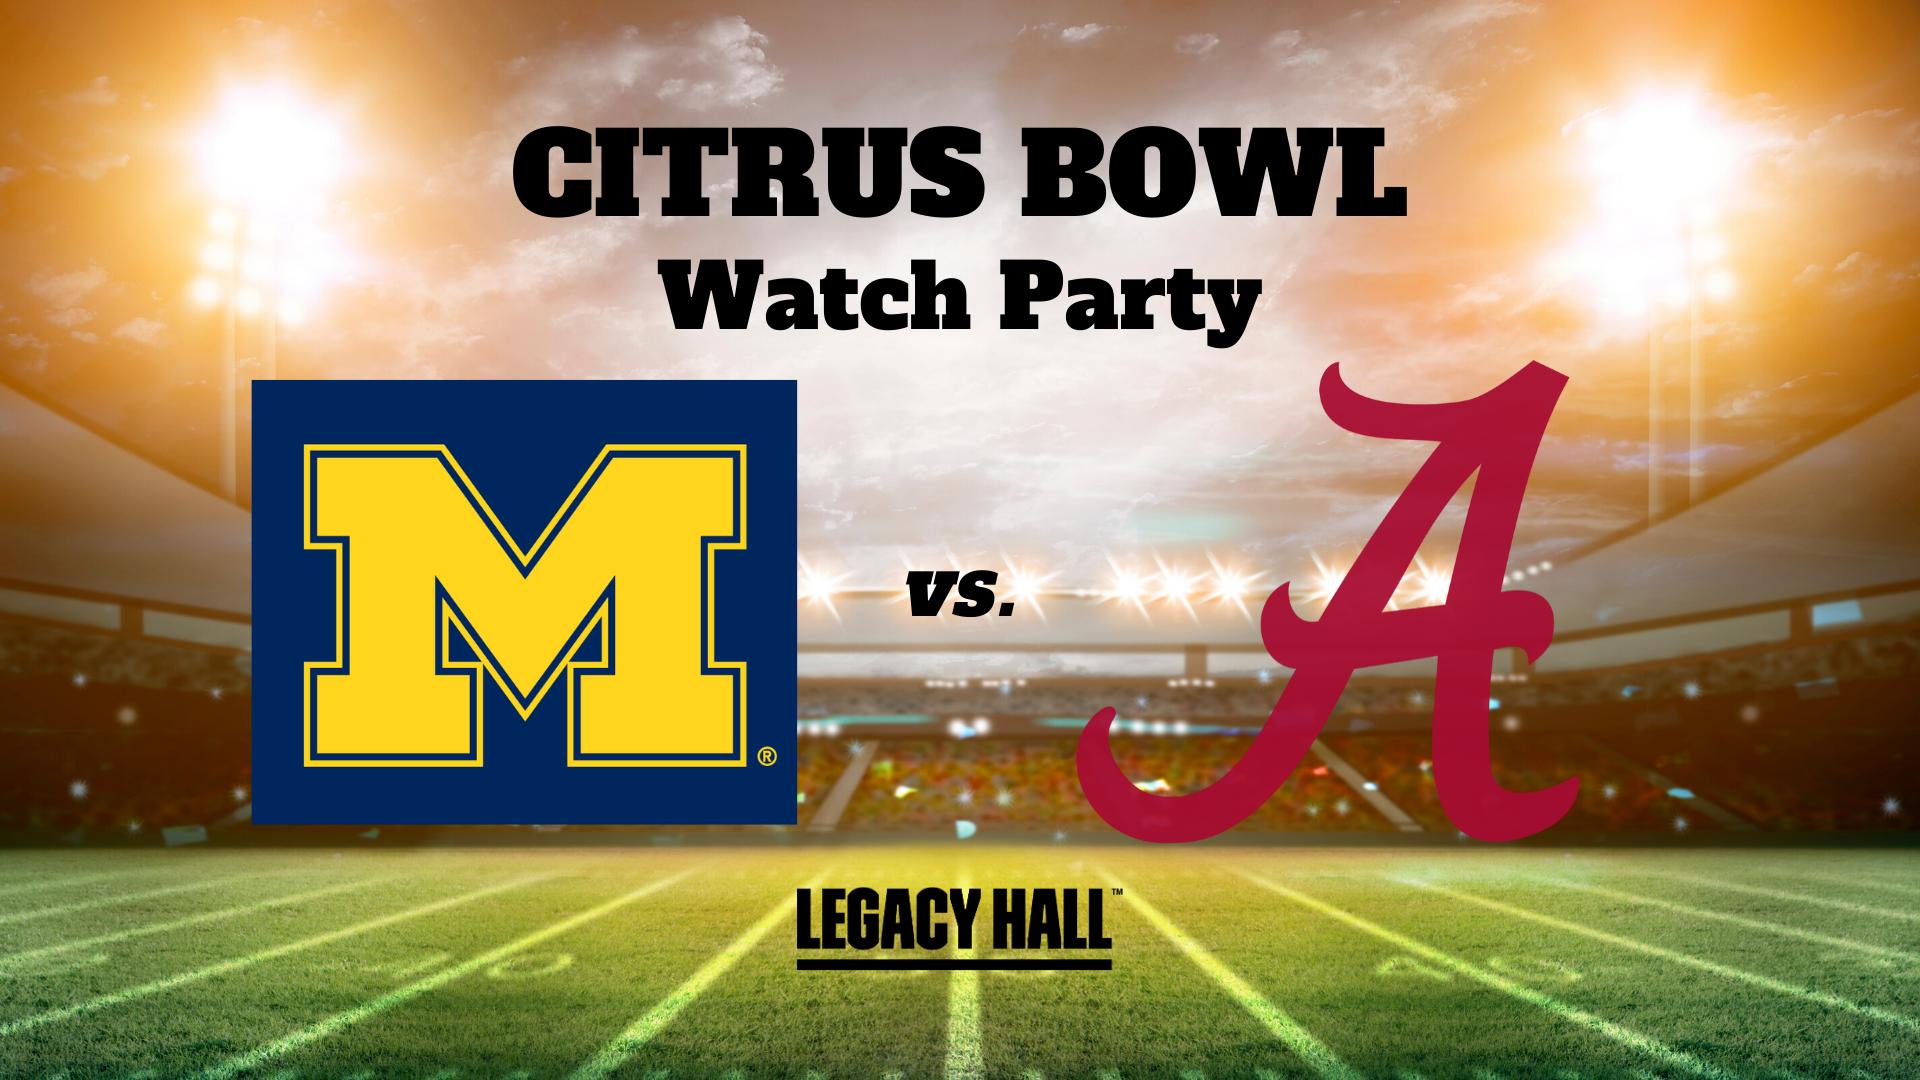 Citrus Bowl Watch Party - hero